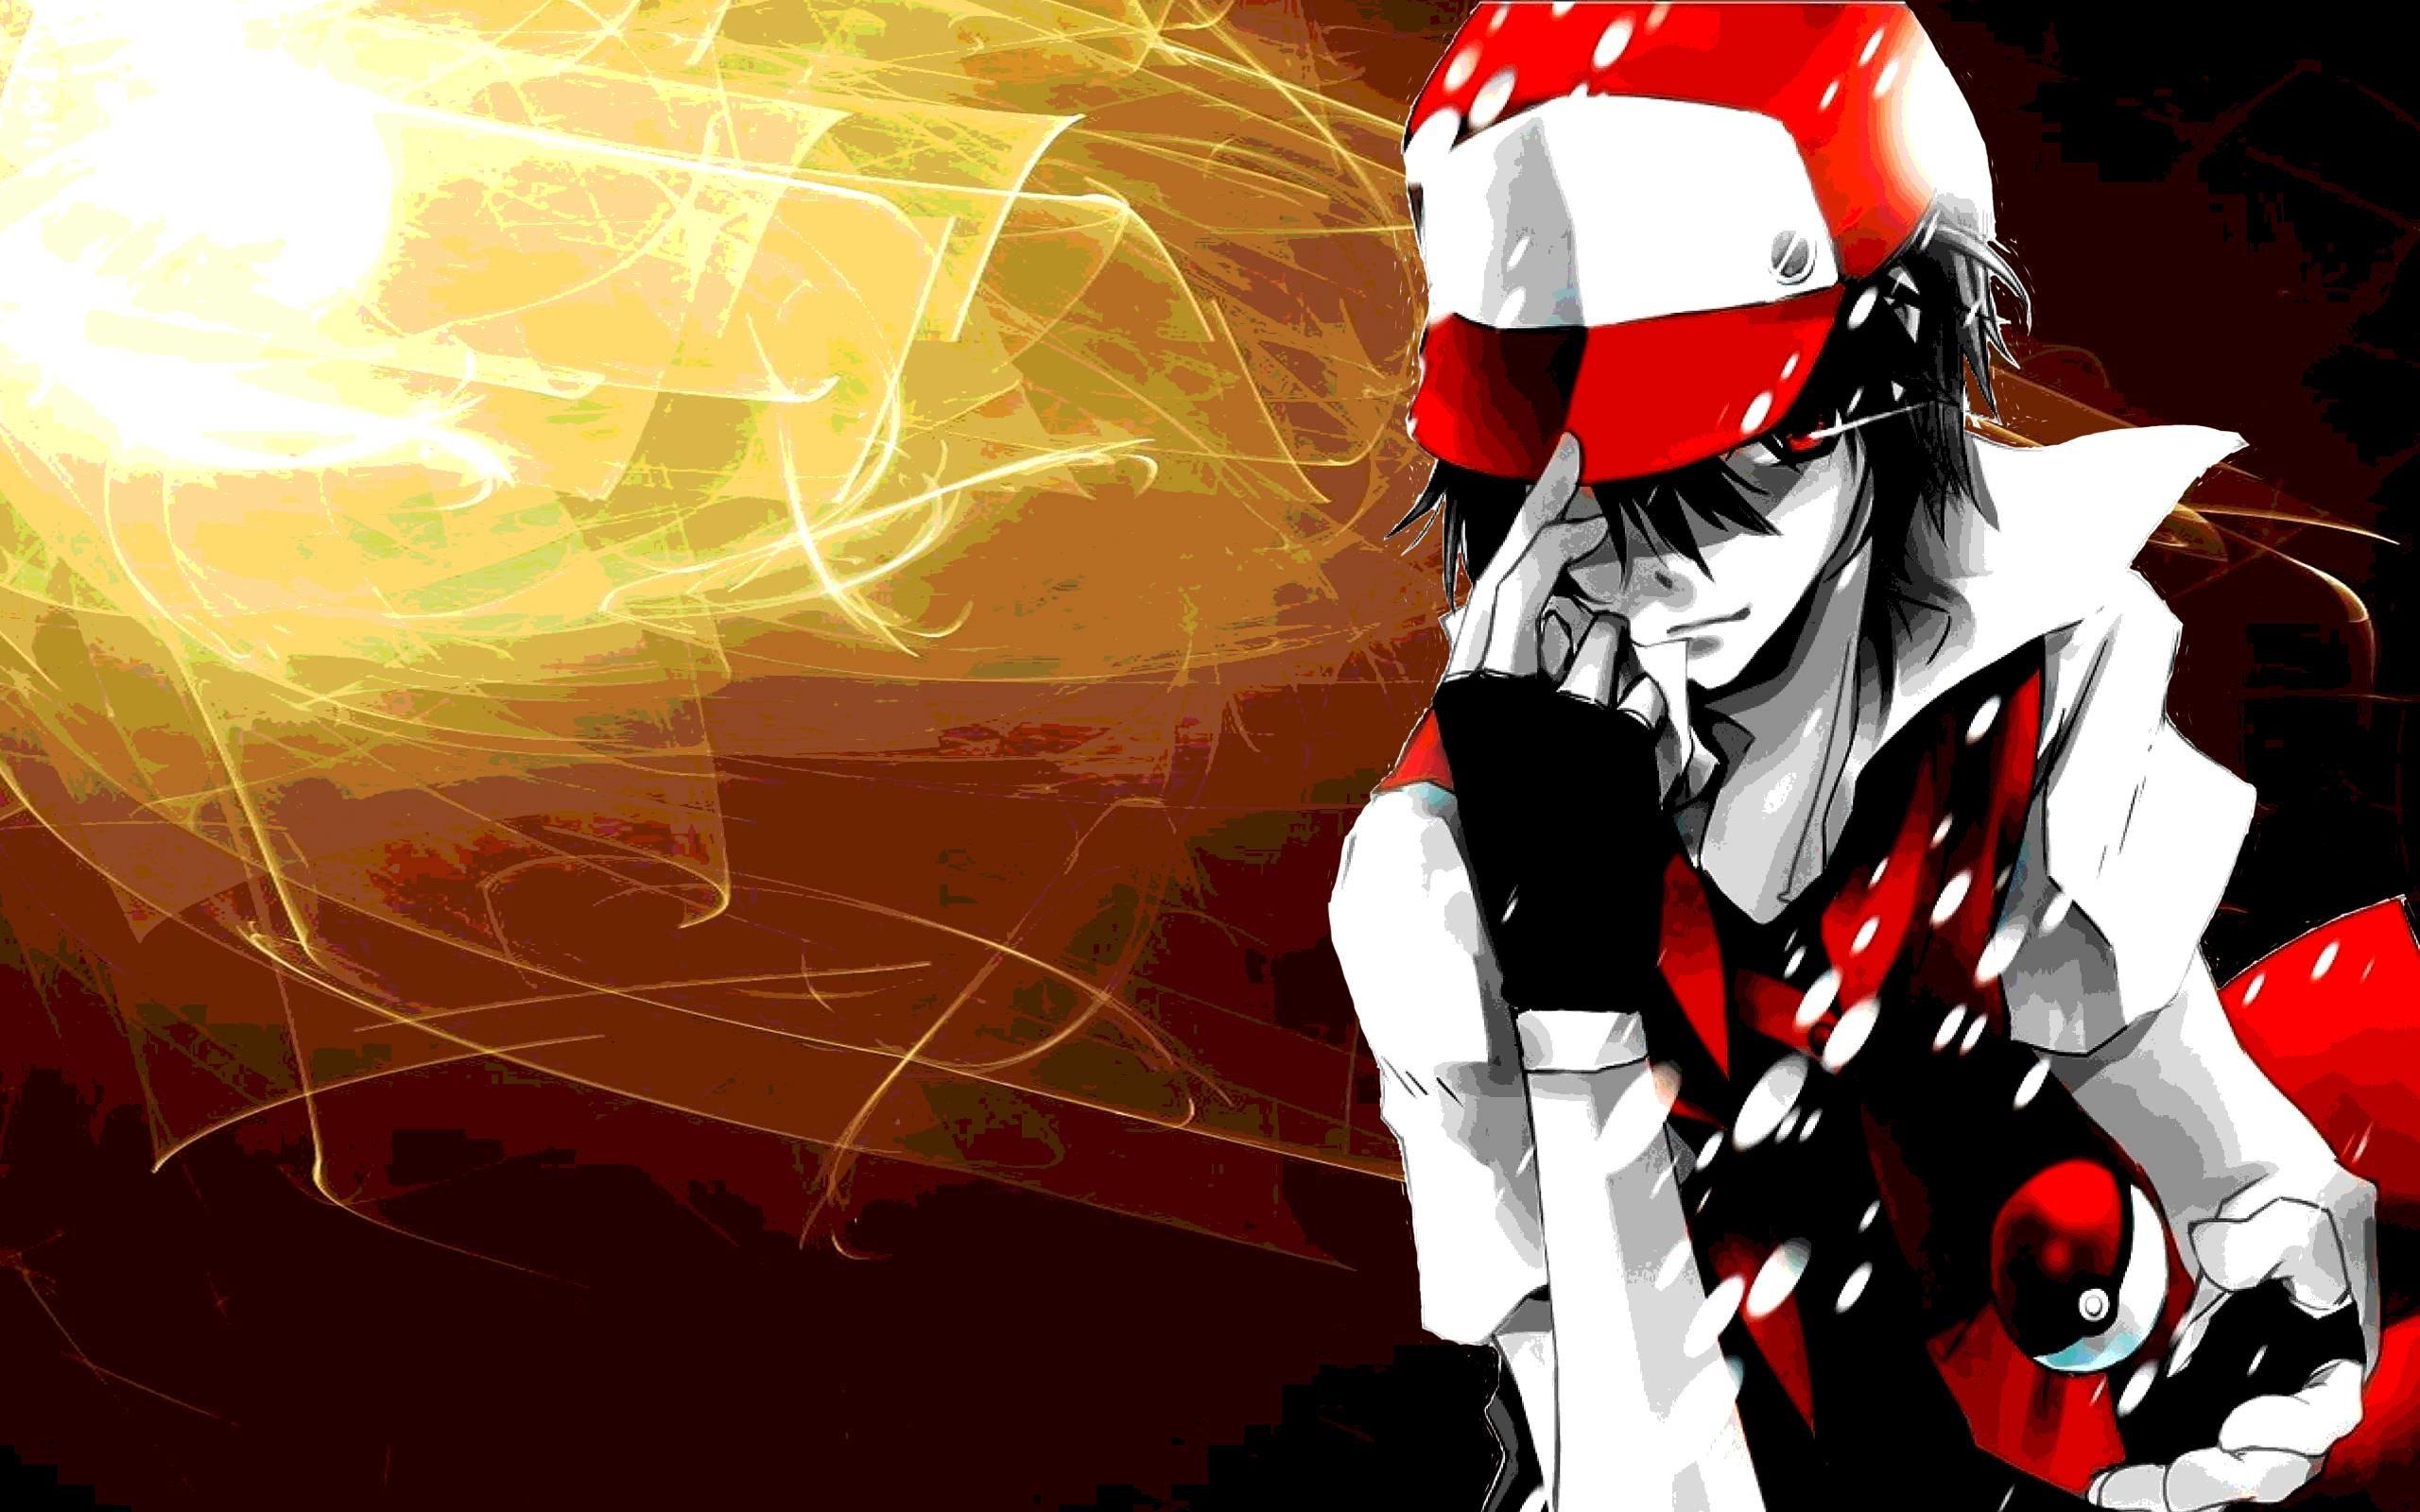 Pokemon HD art: Red Pokemon Trainer by Animeker on DeviantArt